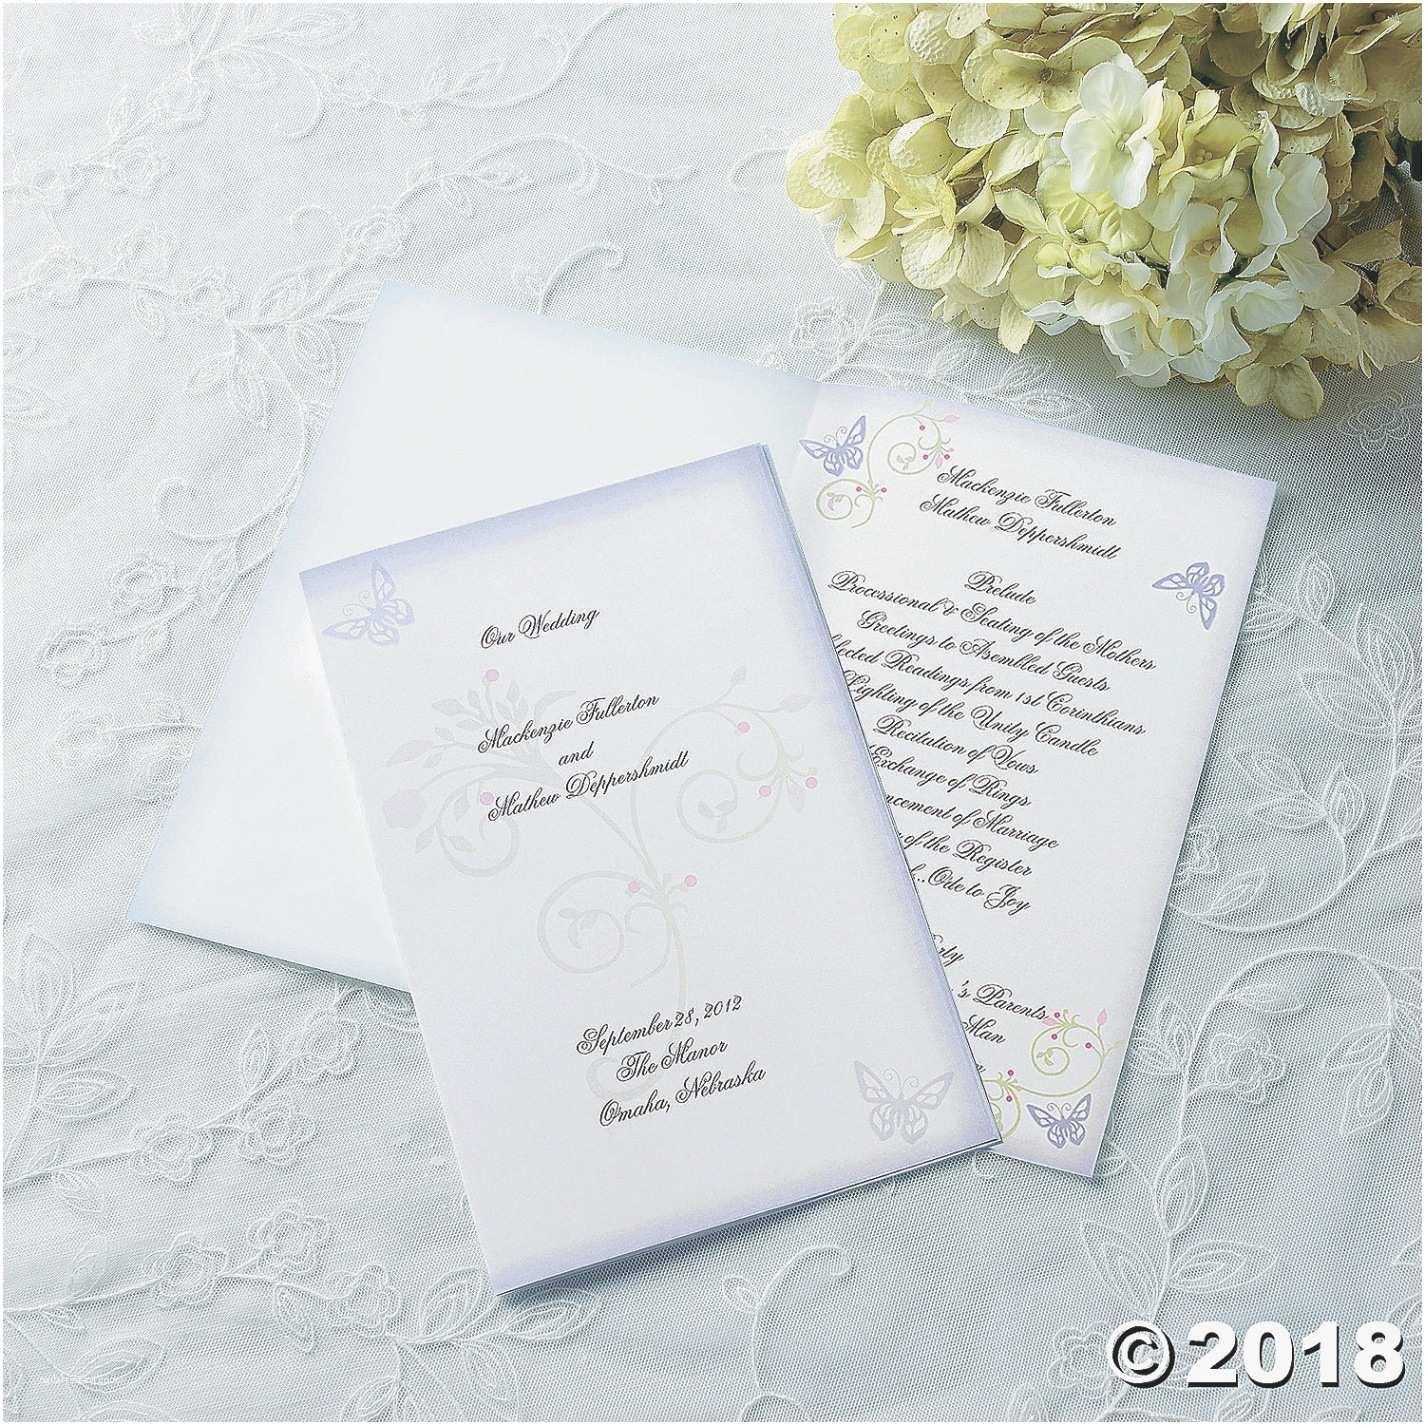 Oriental Trading Company Wedding Invitations Emejing oriental Trading Wedding Catalog Request